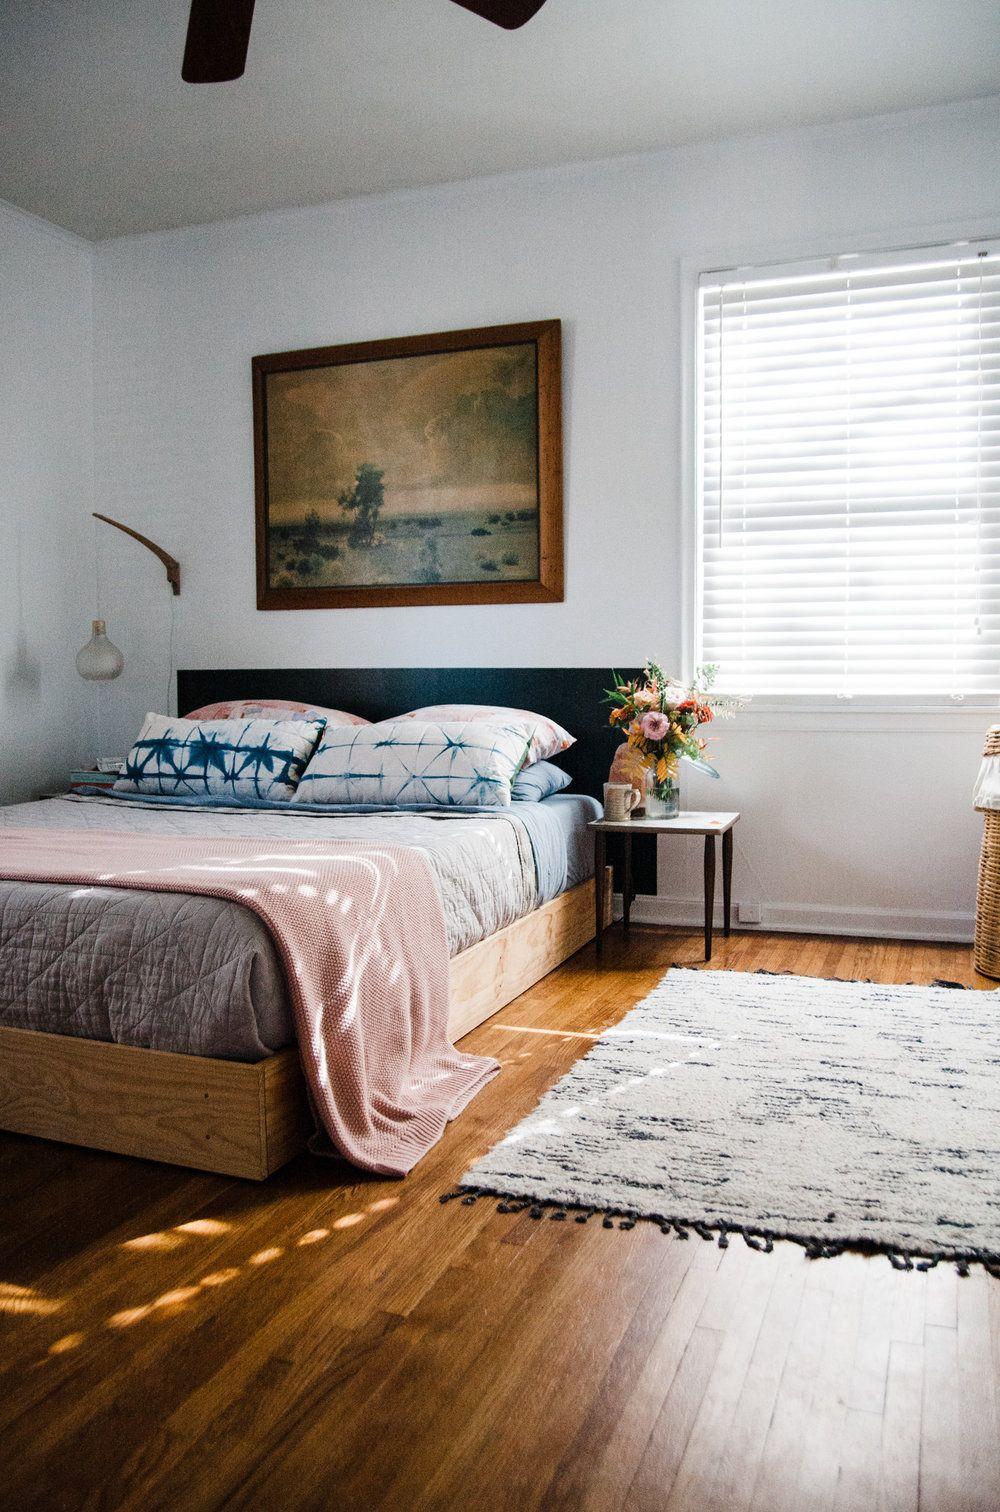 Simple, Modern, Minimal, Colorful Bedroom Update Featuring